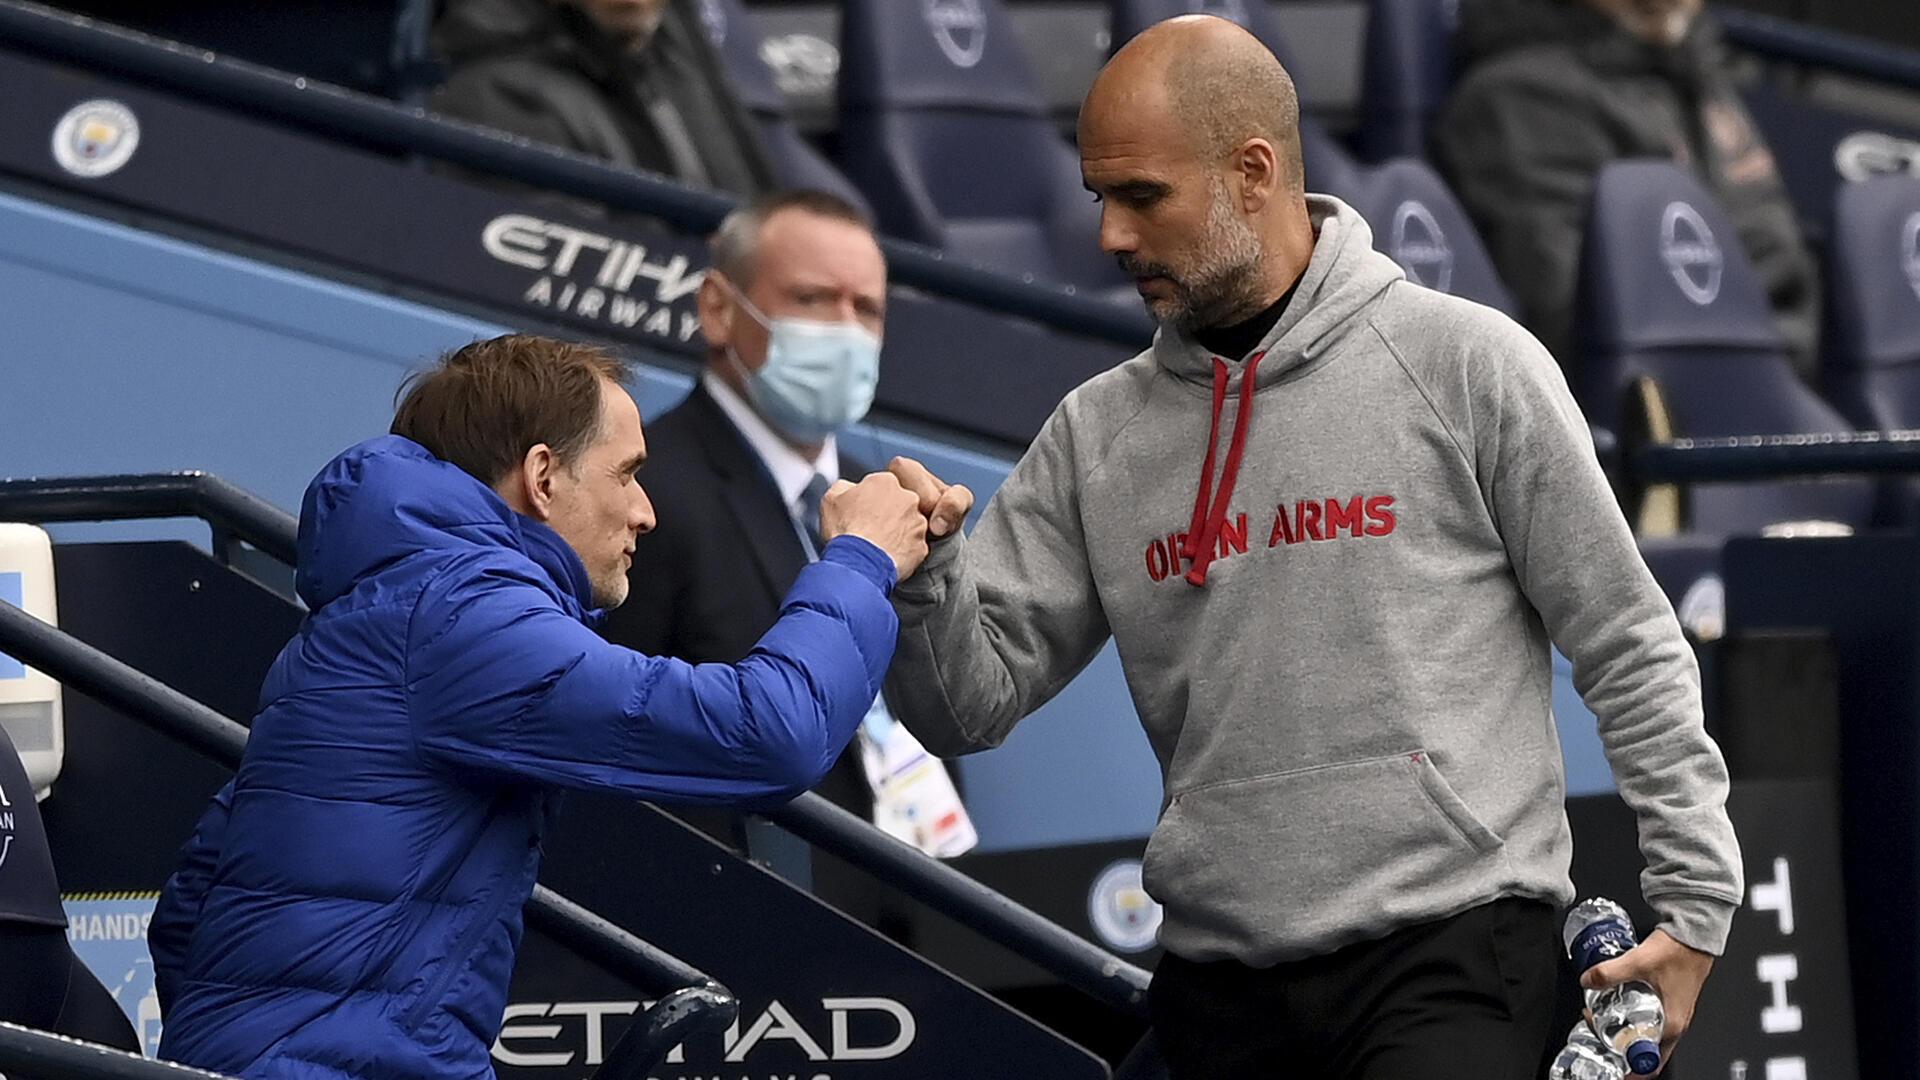 Football - Manchester City - Chelsea - entraineurs - Thomas Tuchel_ Pep Guardiola_AP21128595260170